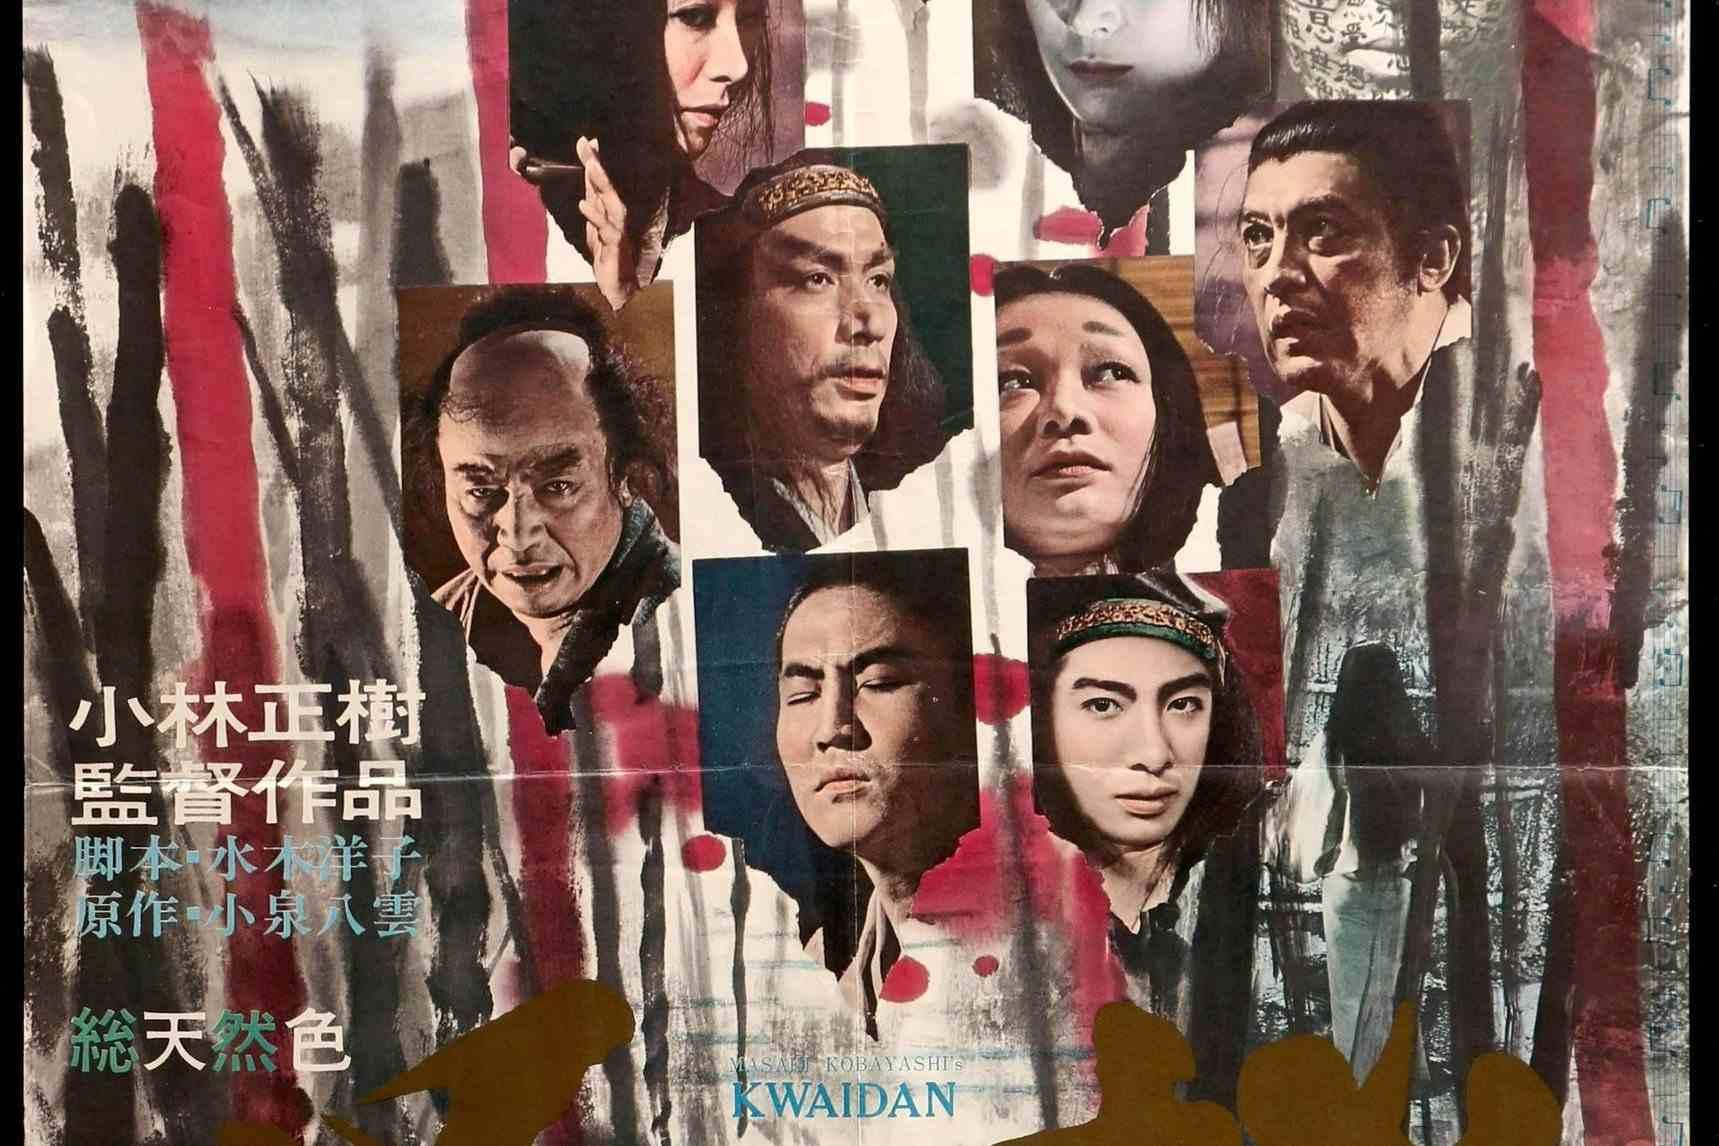 Kwaidan movie poster